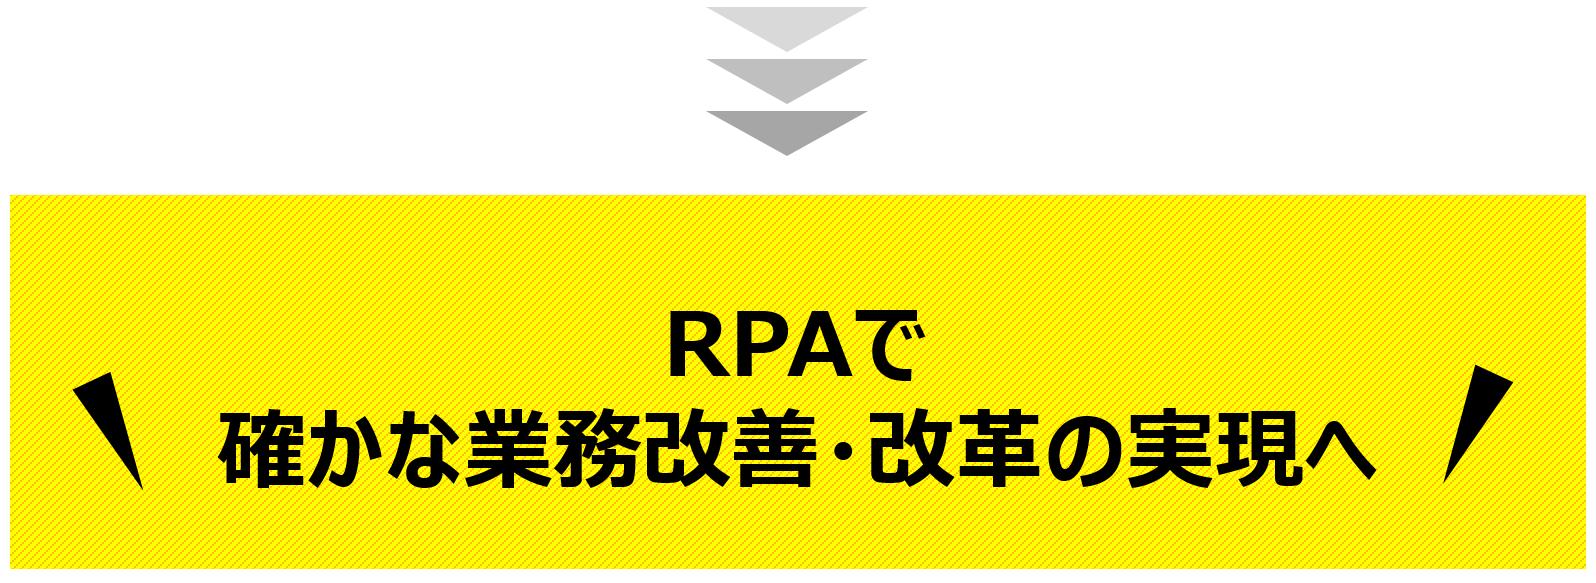 RPAで確かな業務改善の実現へ